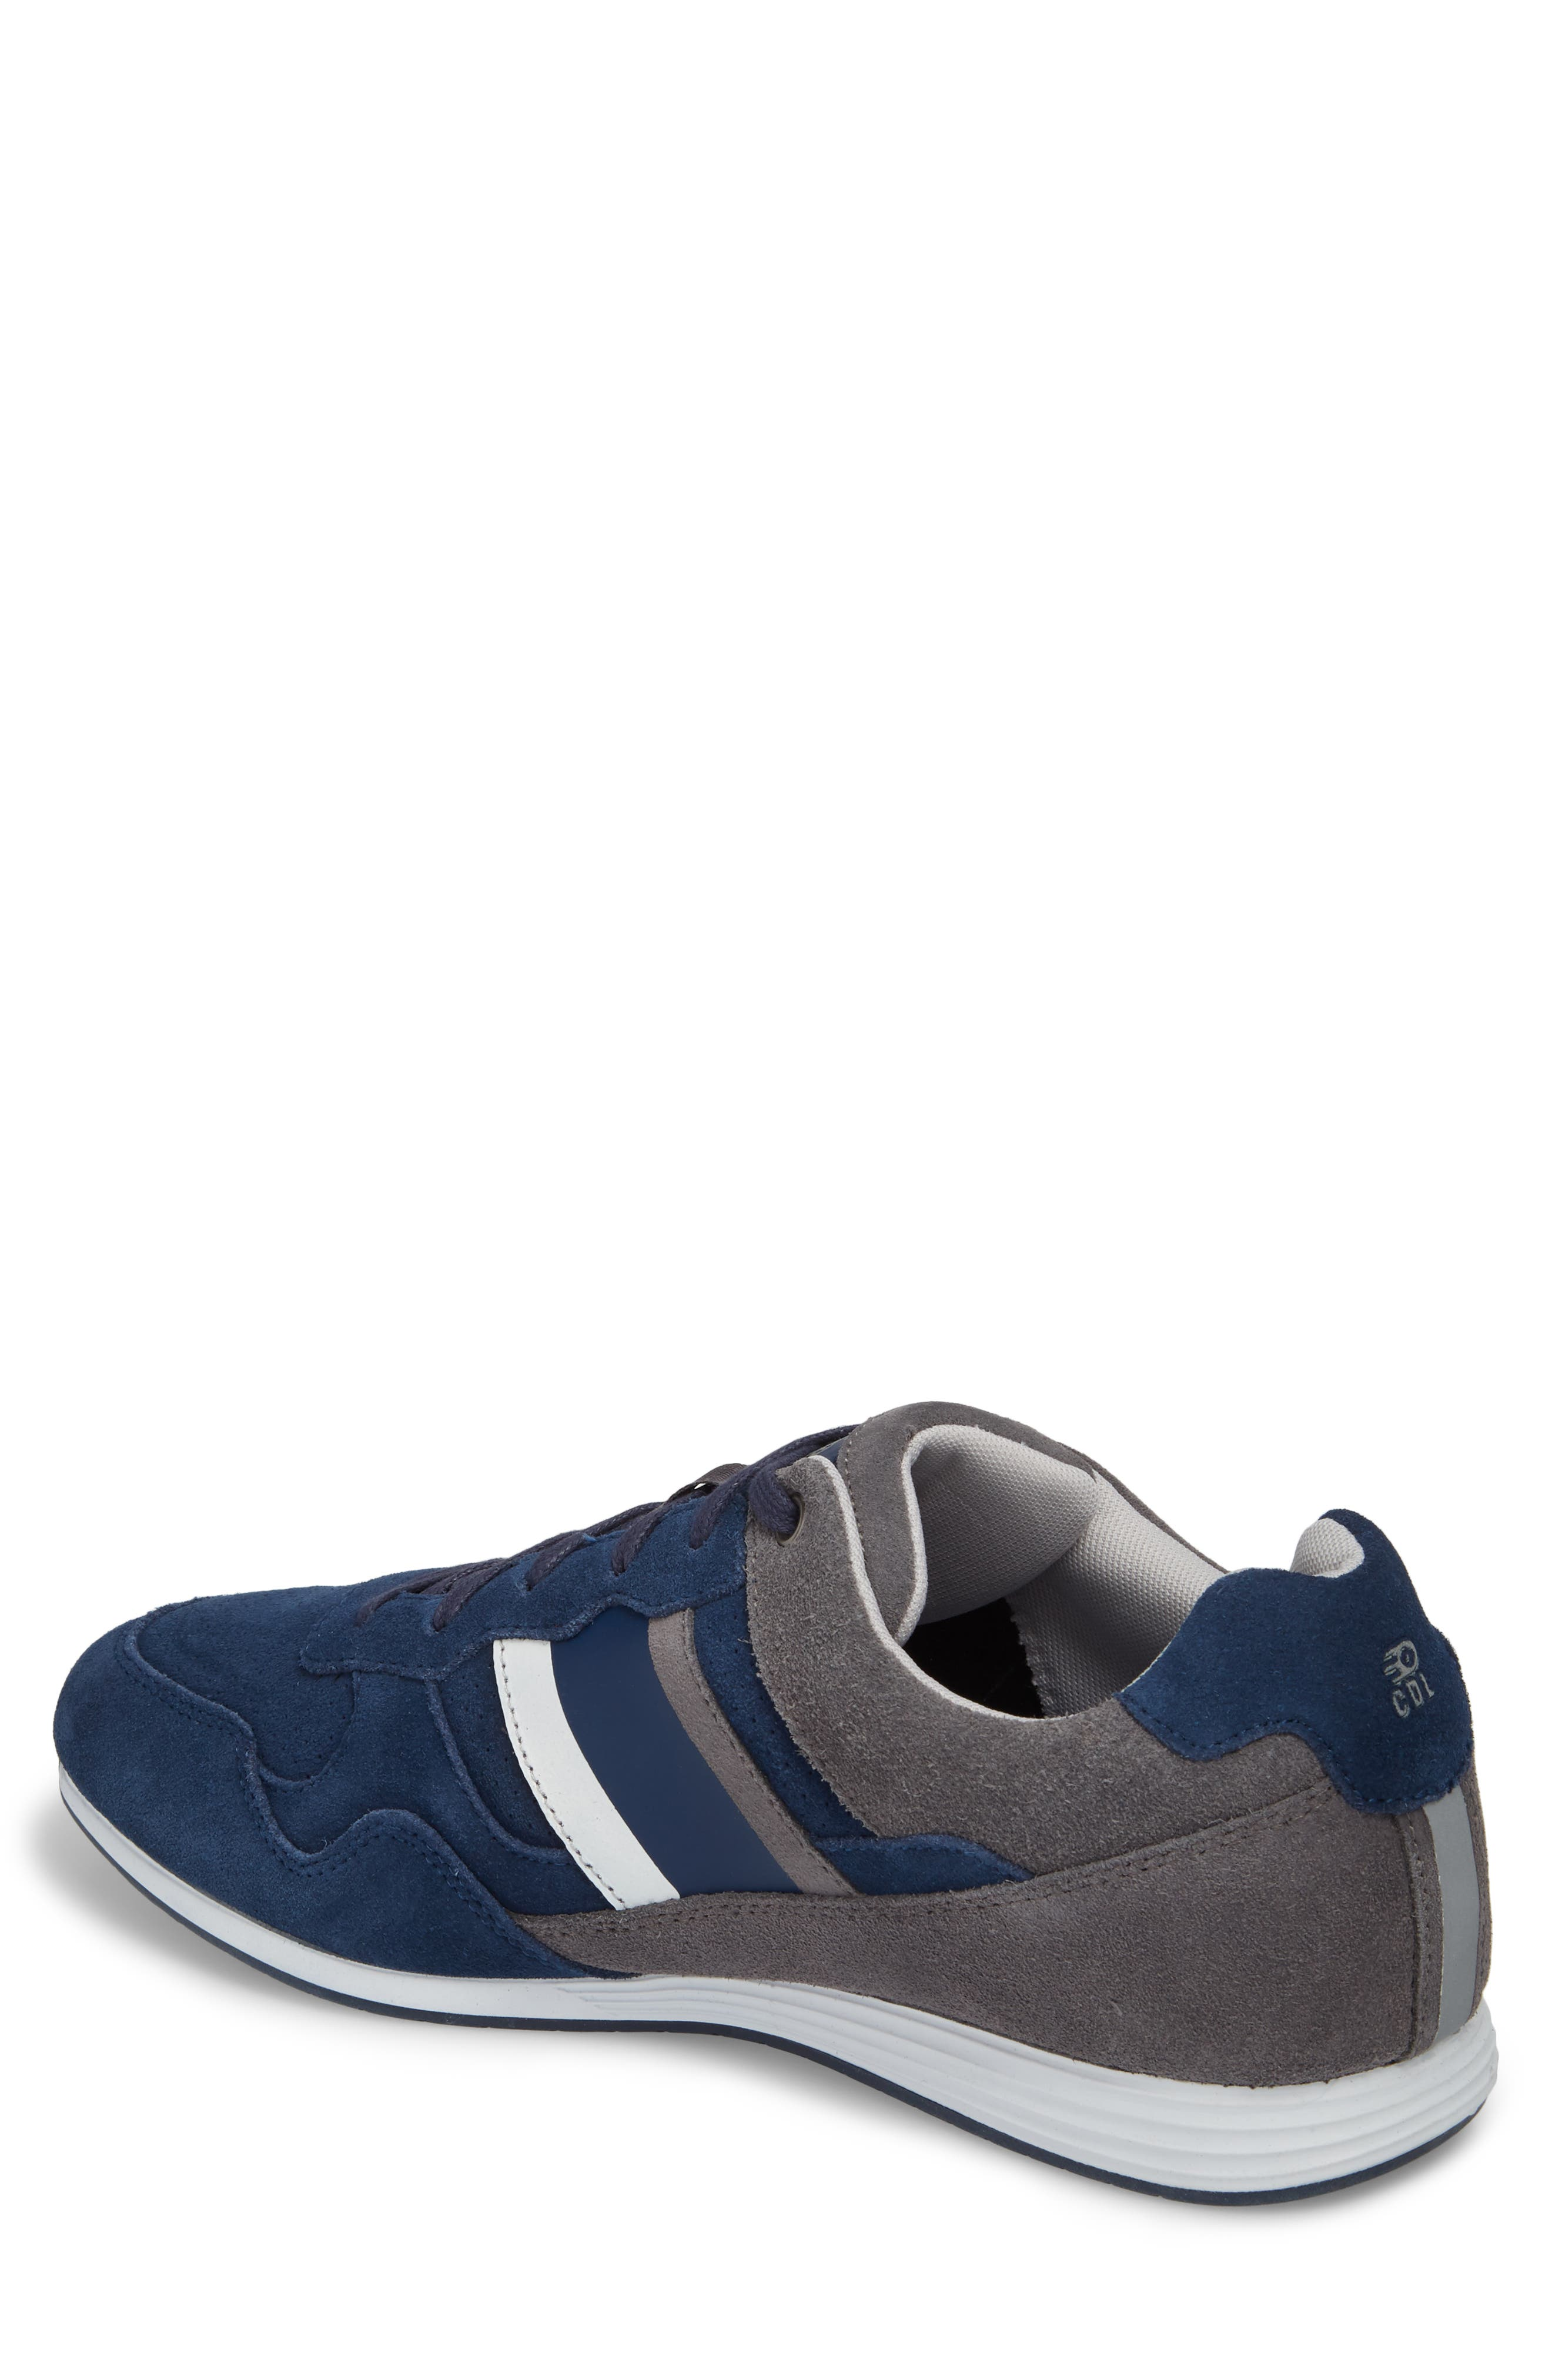 Scarpo Low Top Sneaker,                             Alternate thumbnail 2, color,                             Navy Suede